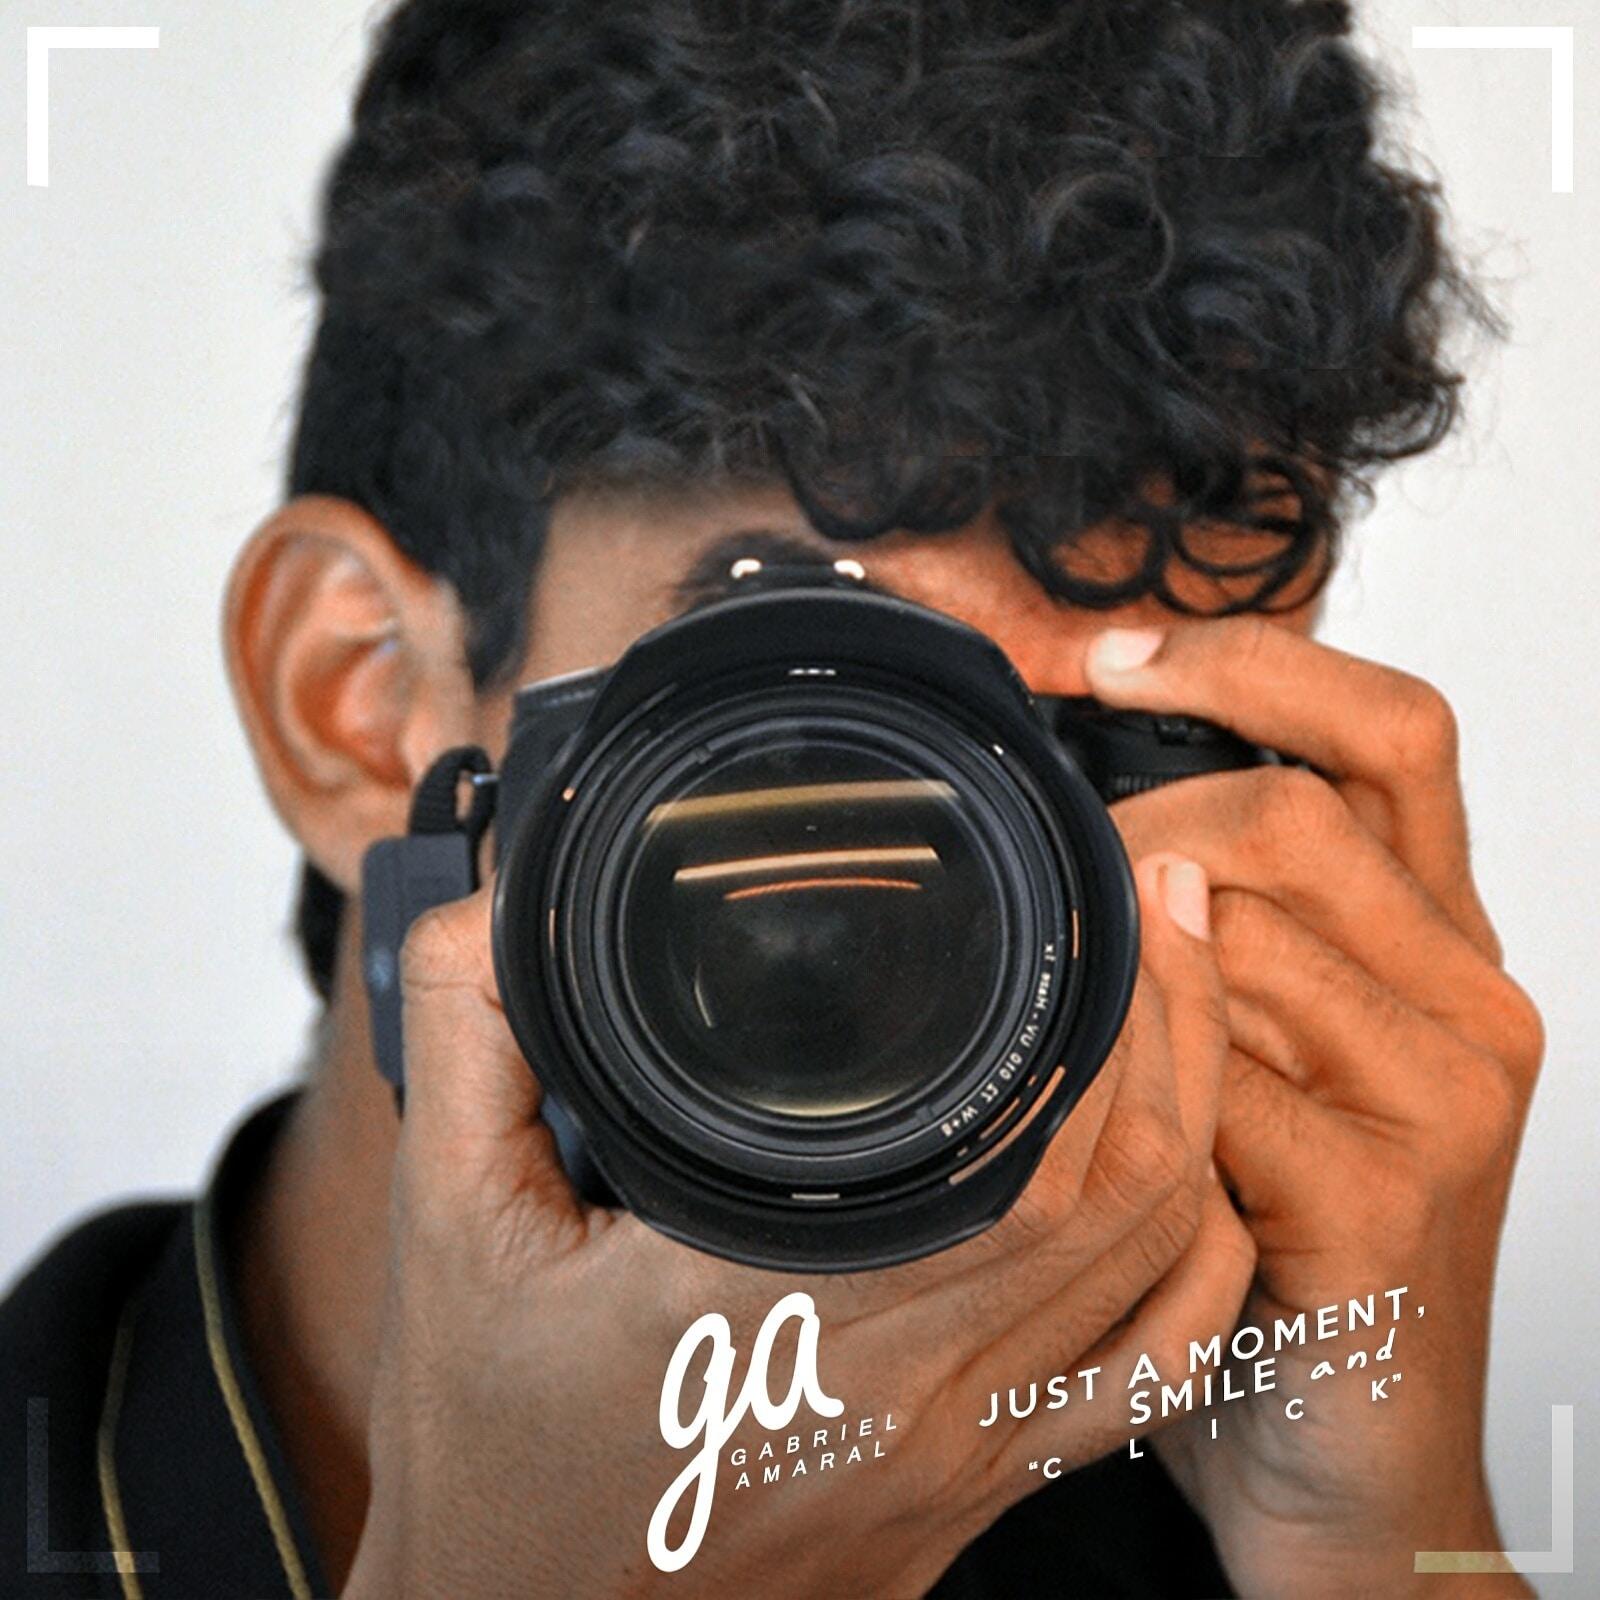 Go to Gabriel Amaral's profile